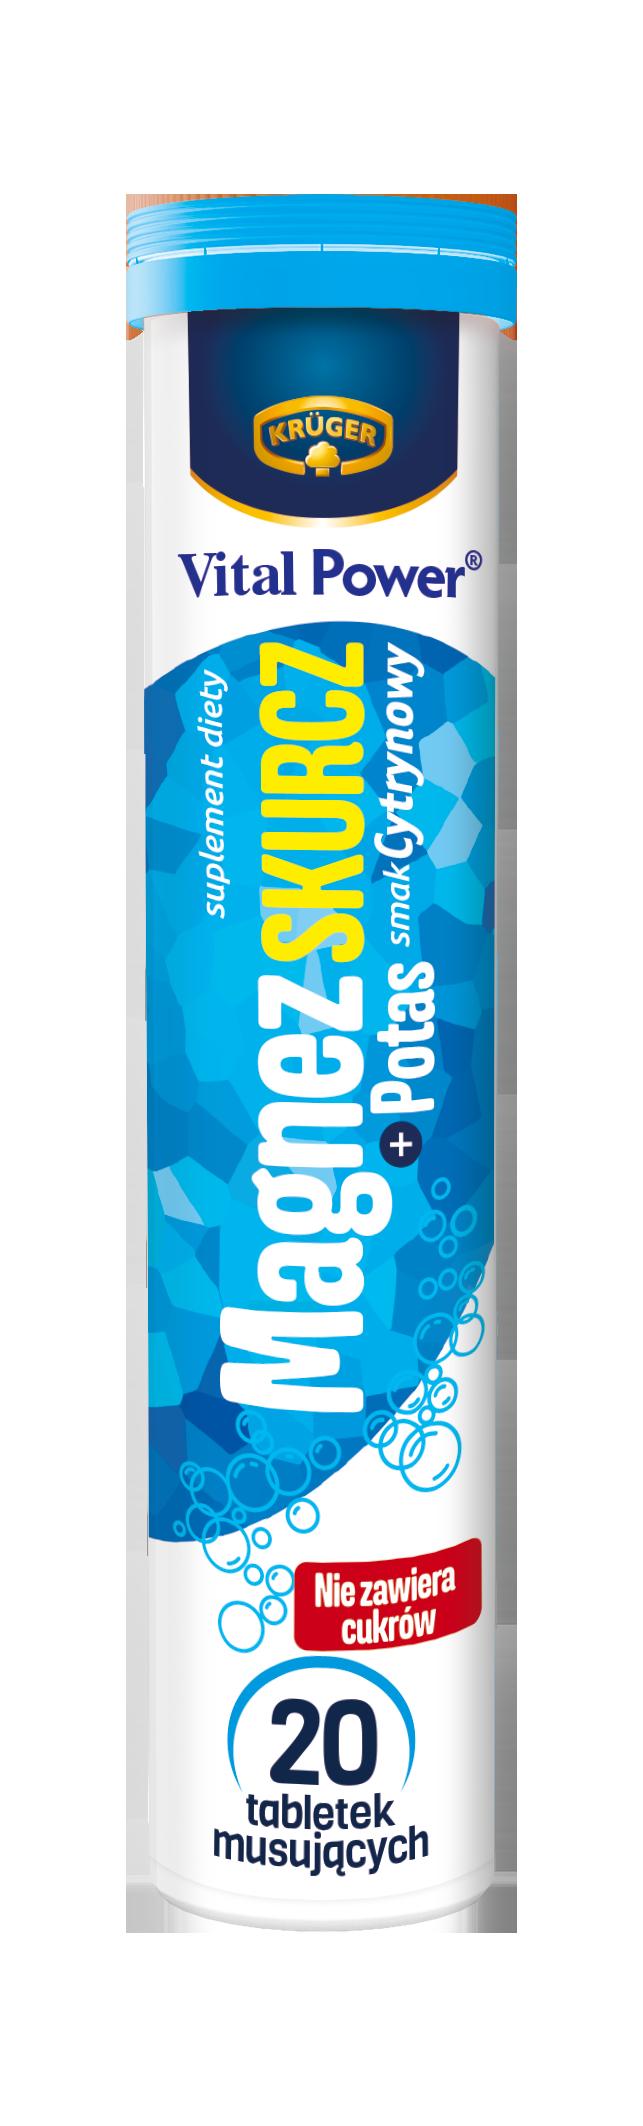 Krüger Magnesium Skurcz + шипучие калиевые таблетки со вкусом лимона